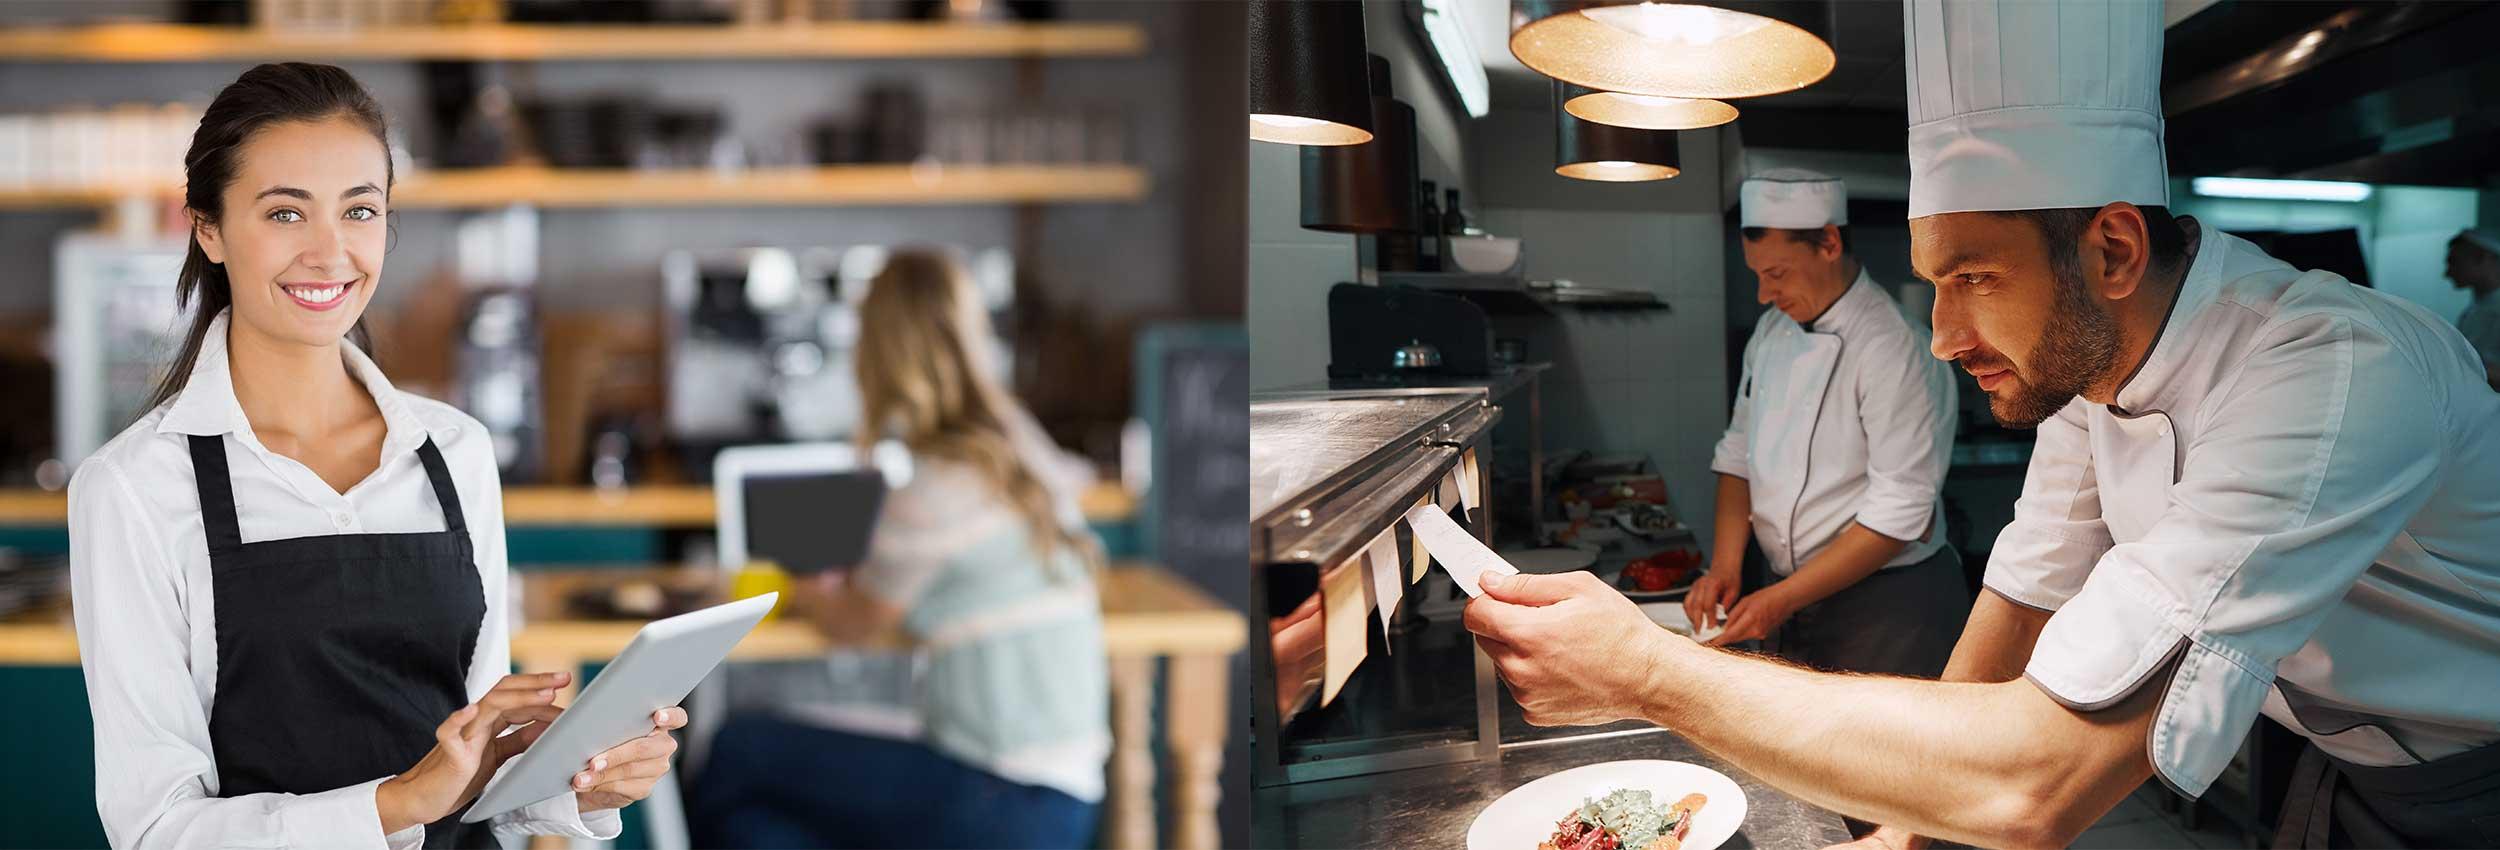 Serveur, cuisinier restaurant